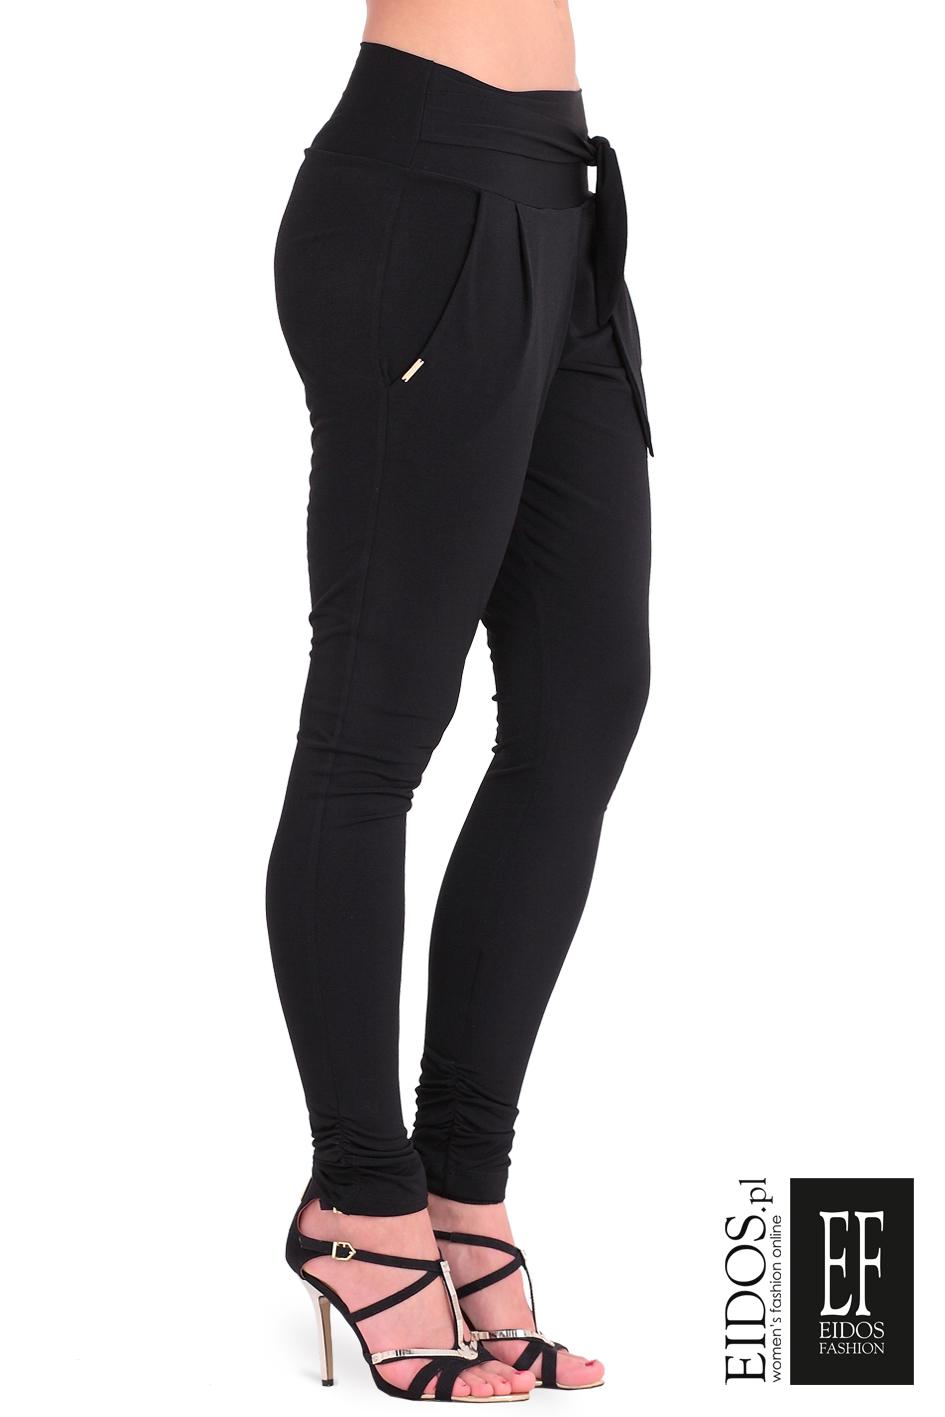 bd8498ca Damskie spodnie NEW YORK czarne - Eidos